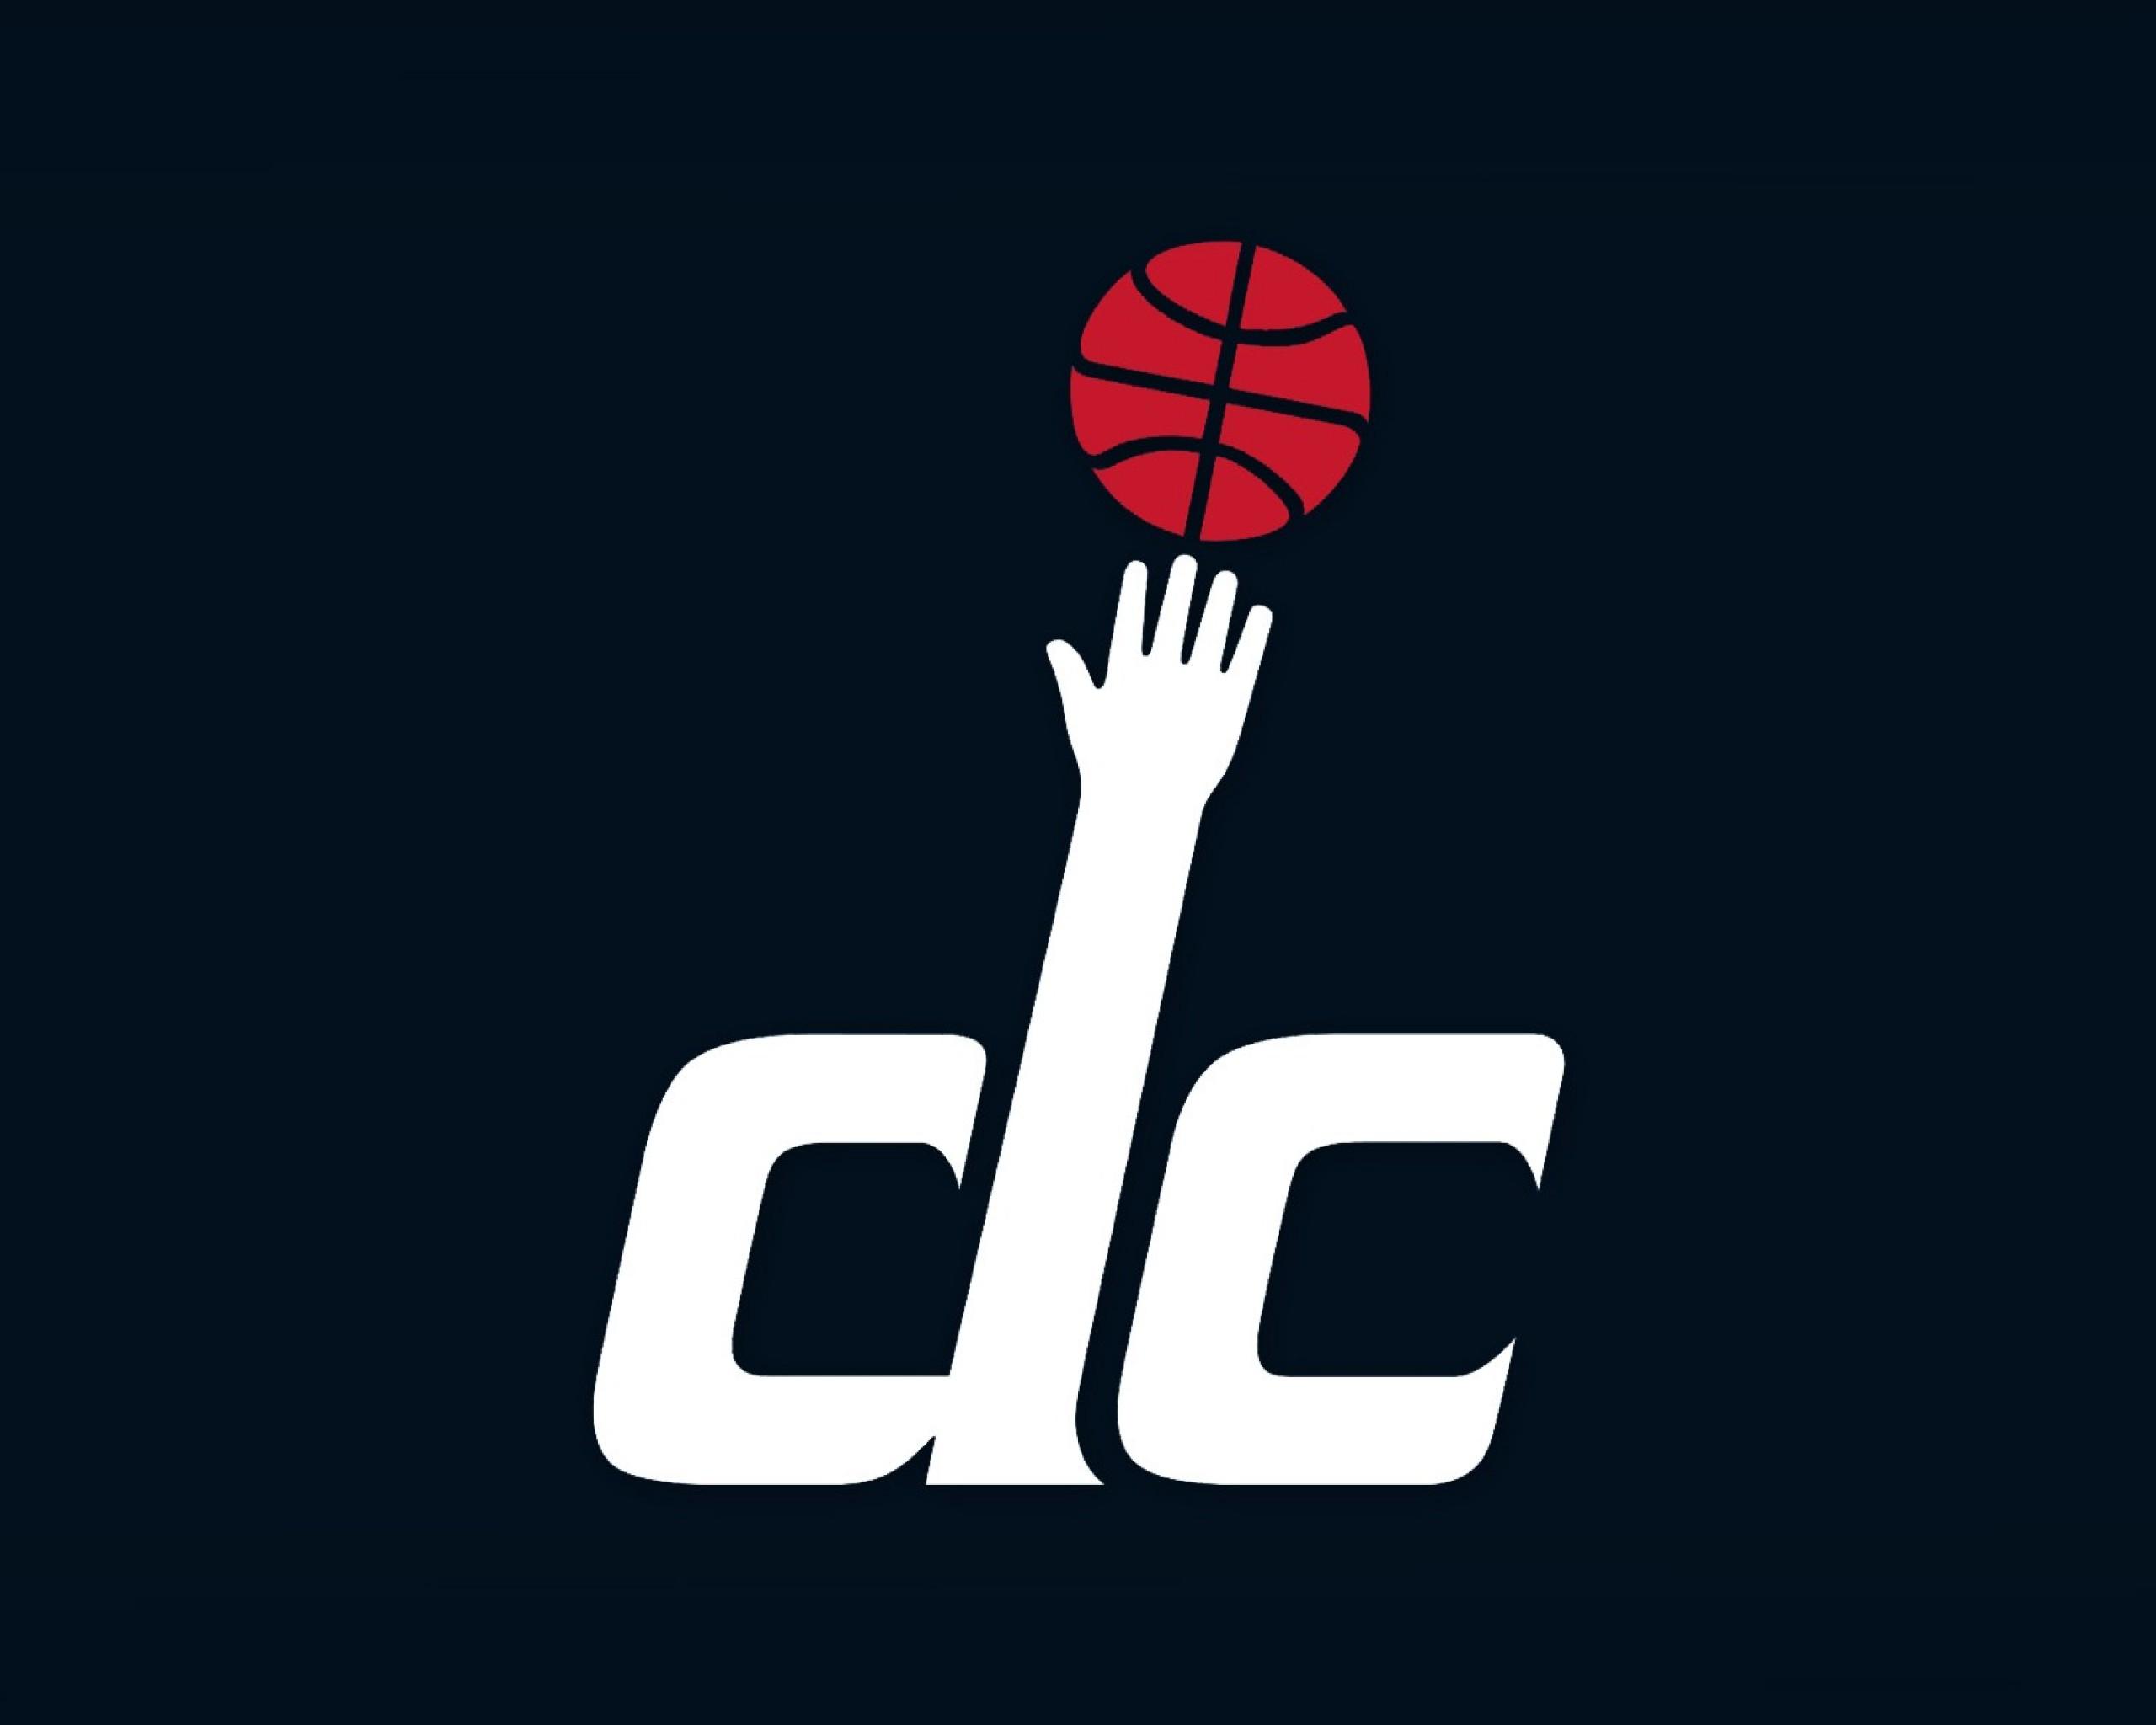 WASHINGTON WIZARDS nba basketball 24 wallpaper 2560x2048 226675 2560x2048